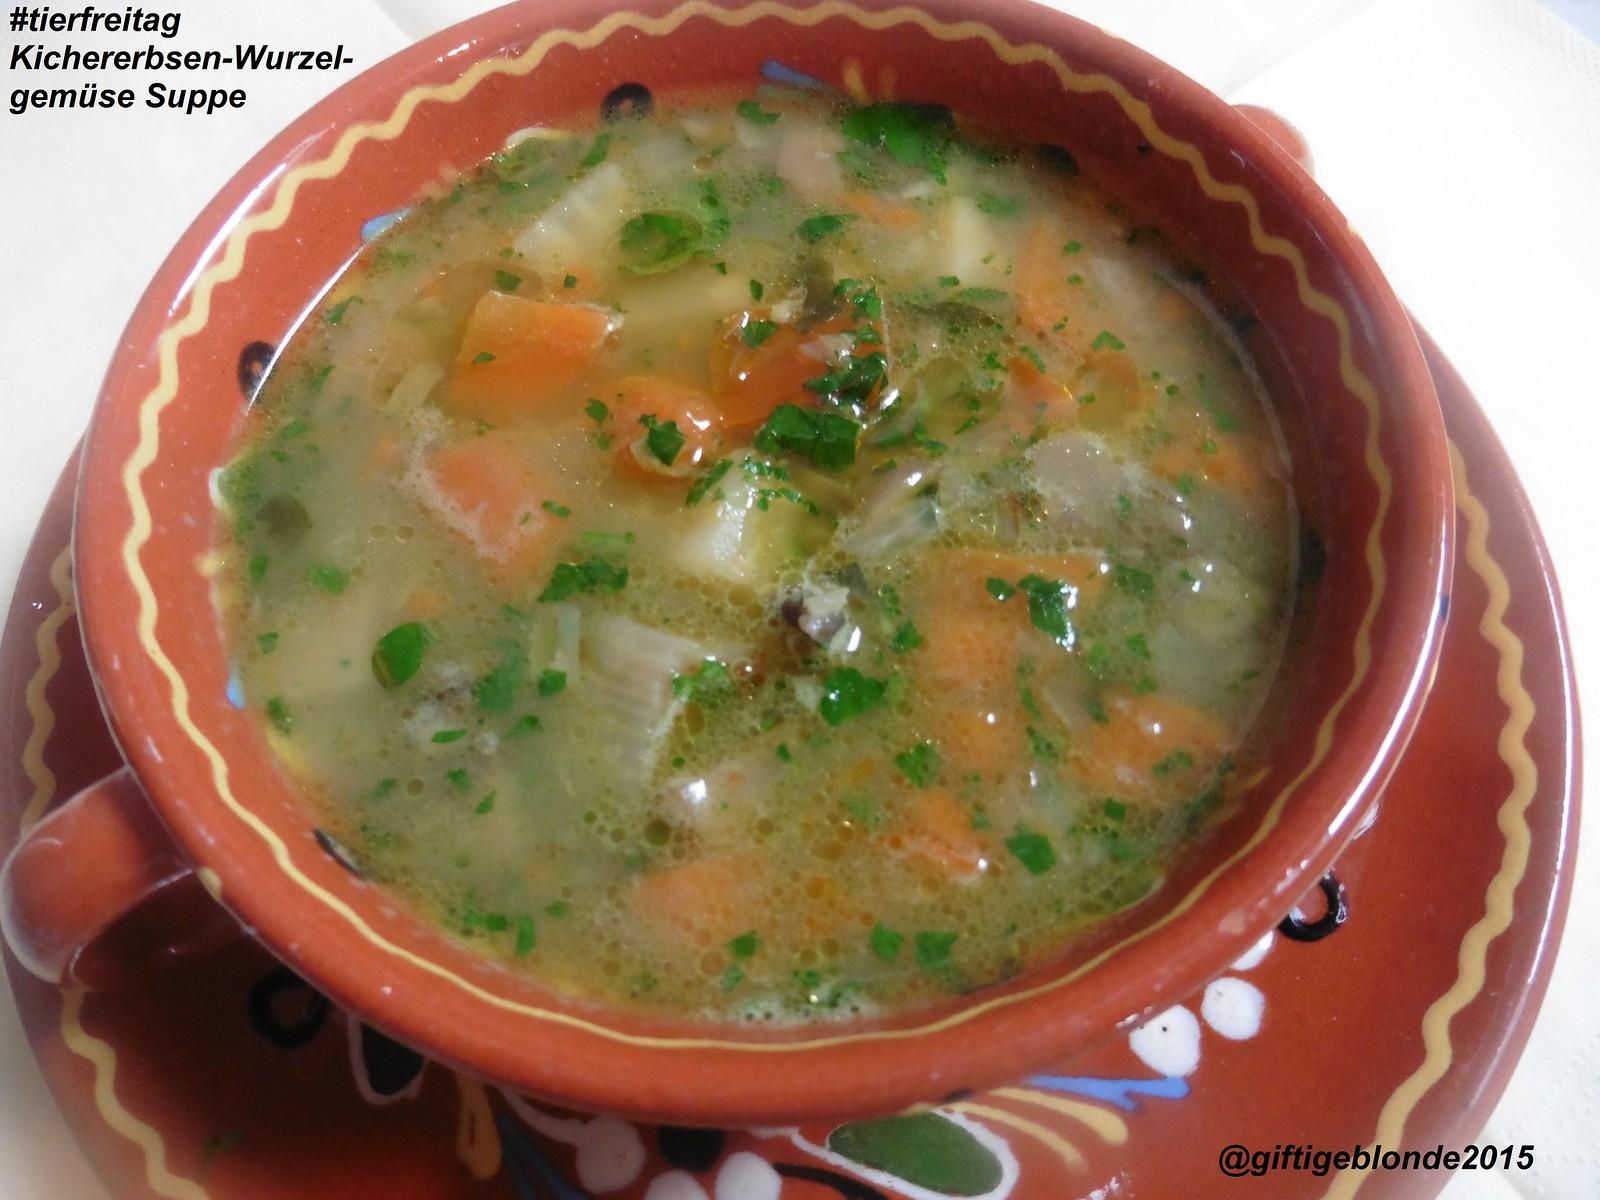 Kichererbsen-Wurzelgemüse Suppe